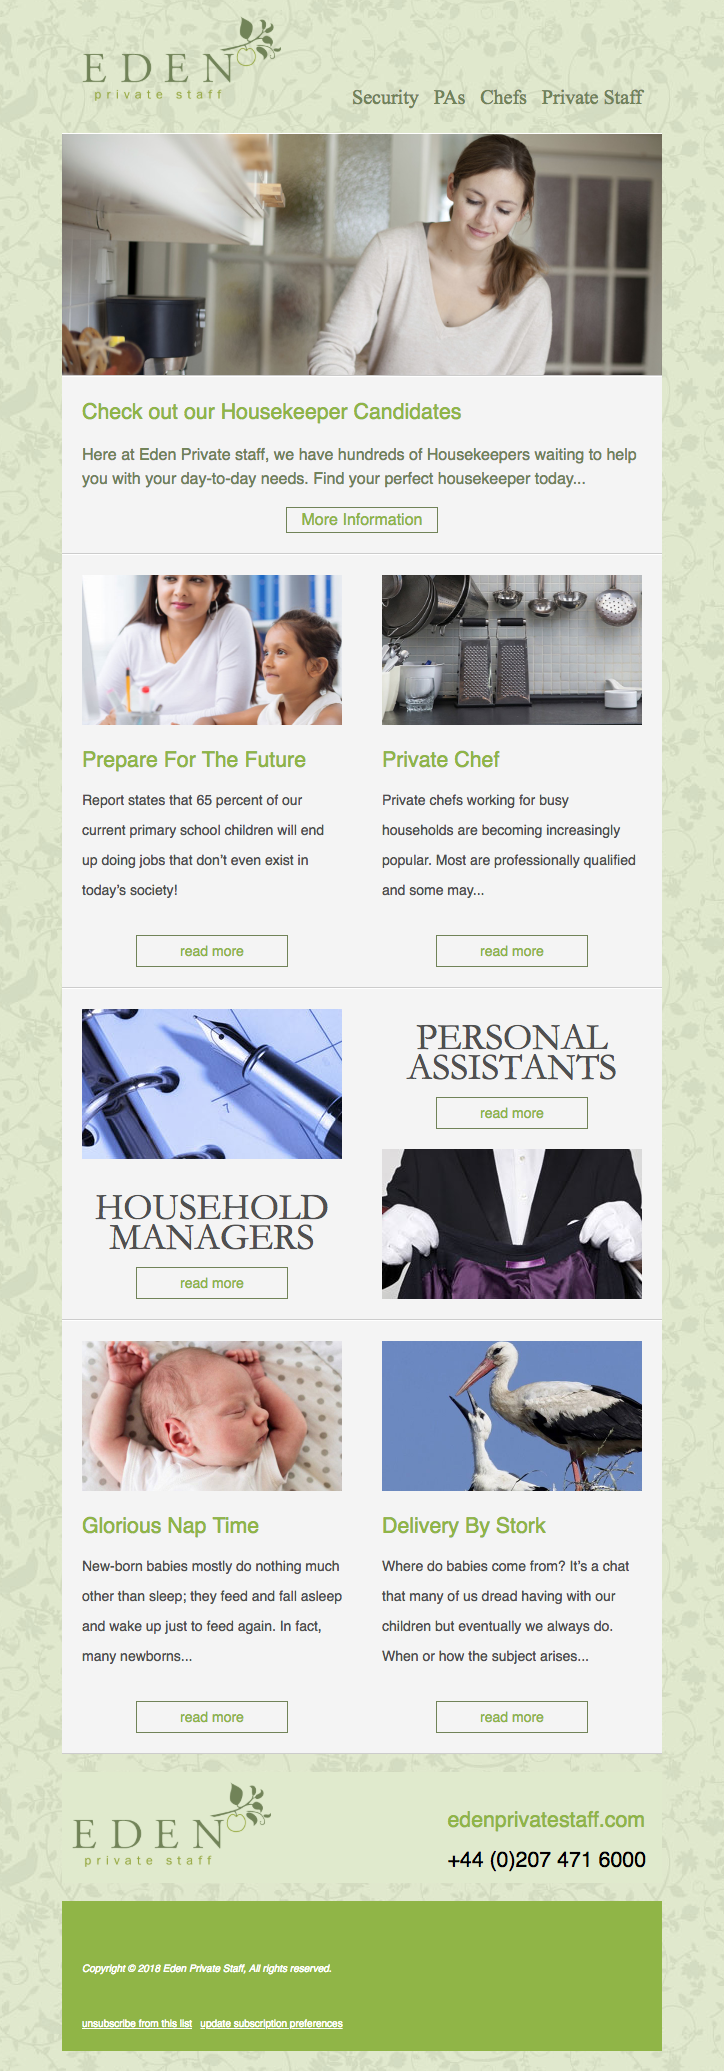 Newsletter Design & Build, Account Management, Content Creation & eCommerce Automation